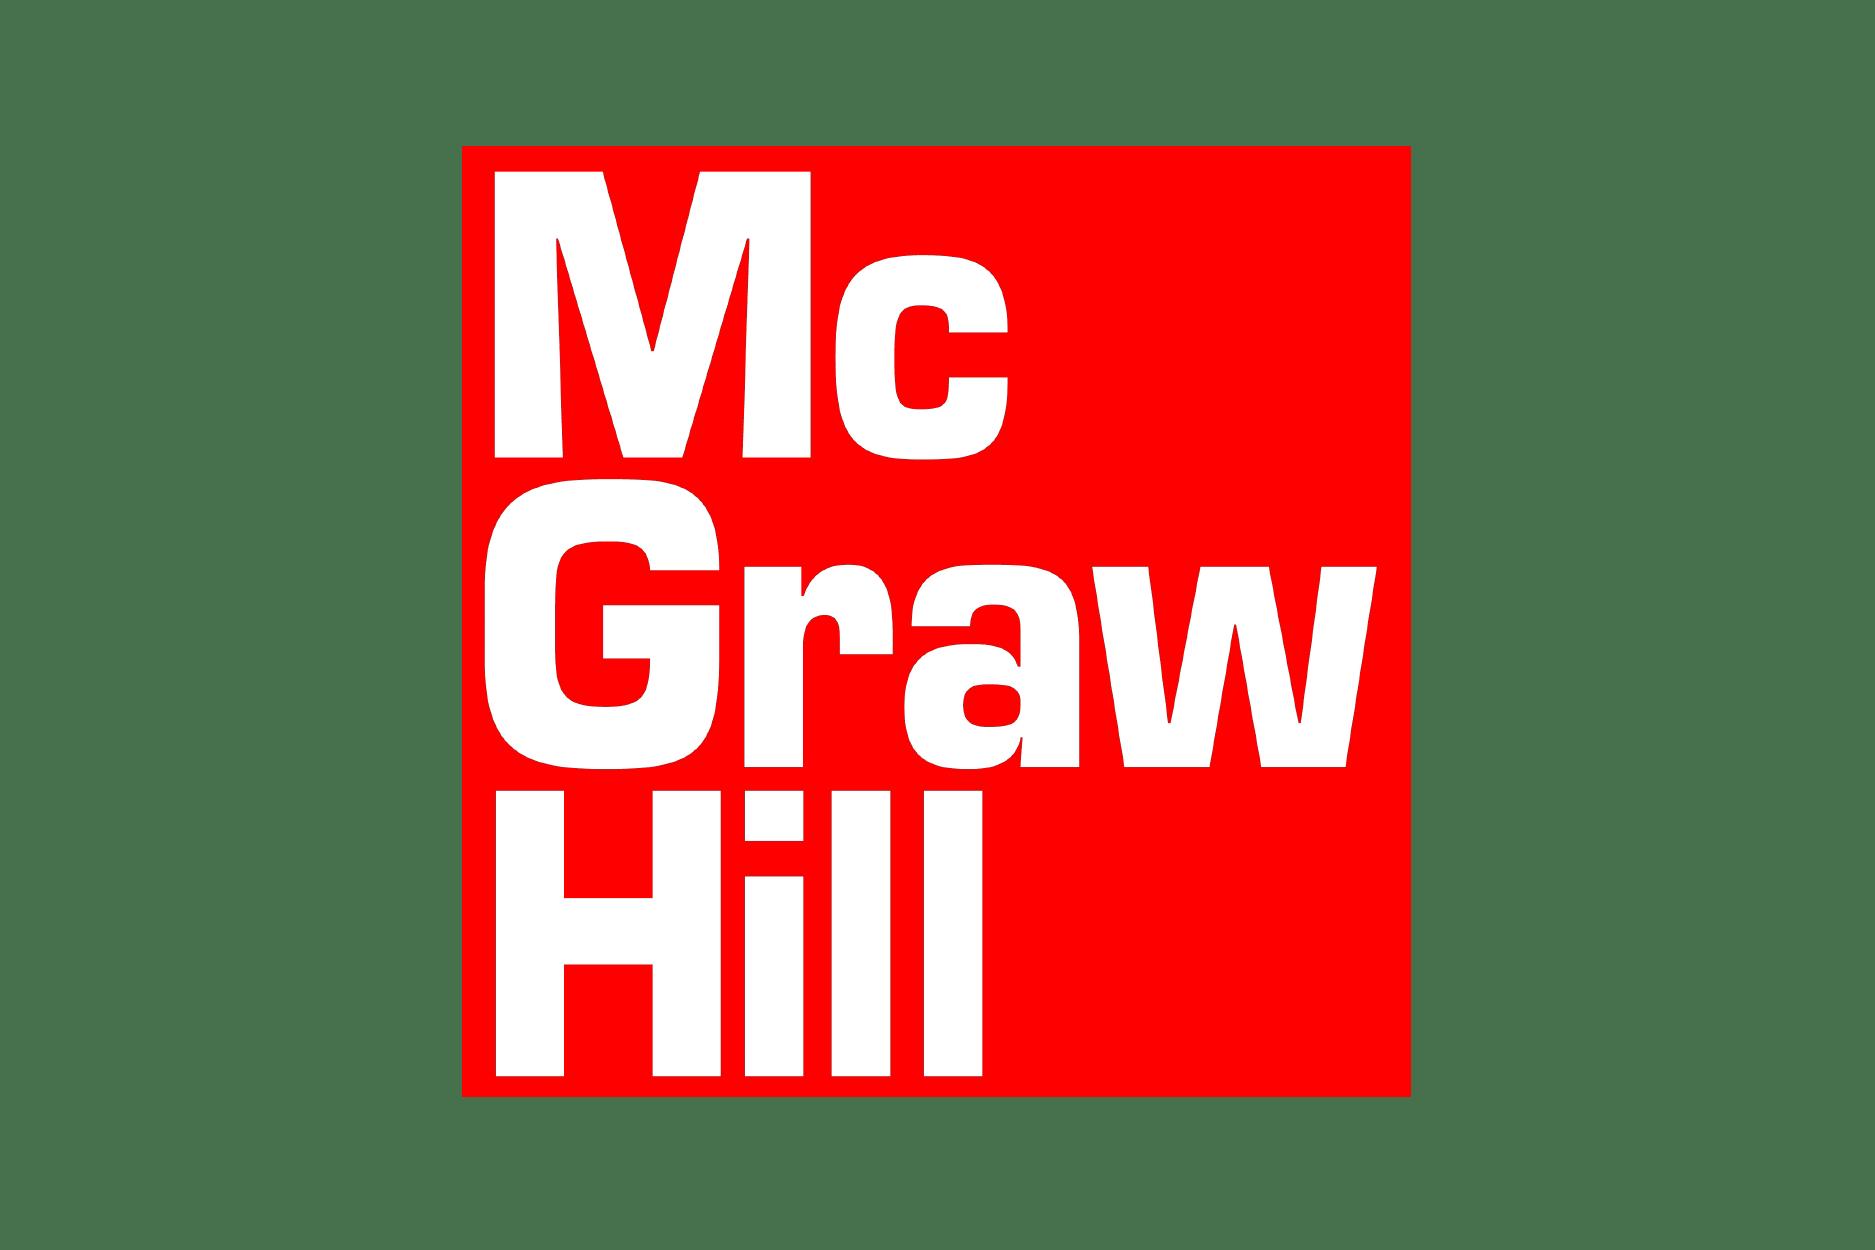 Webinar Mcgraw Hill Use Case  Sumo Logic